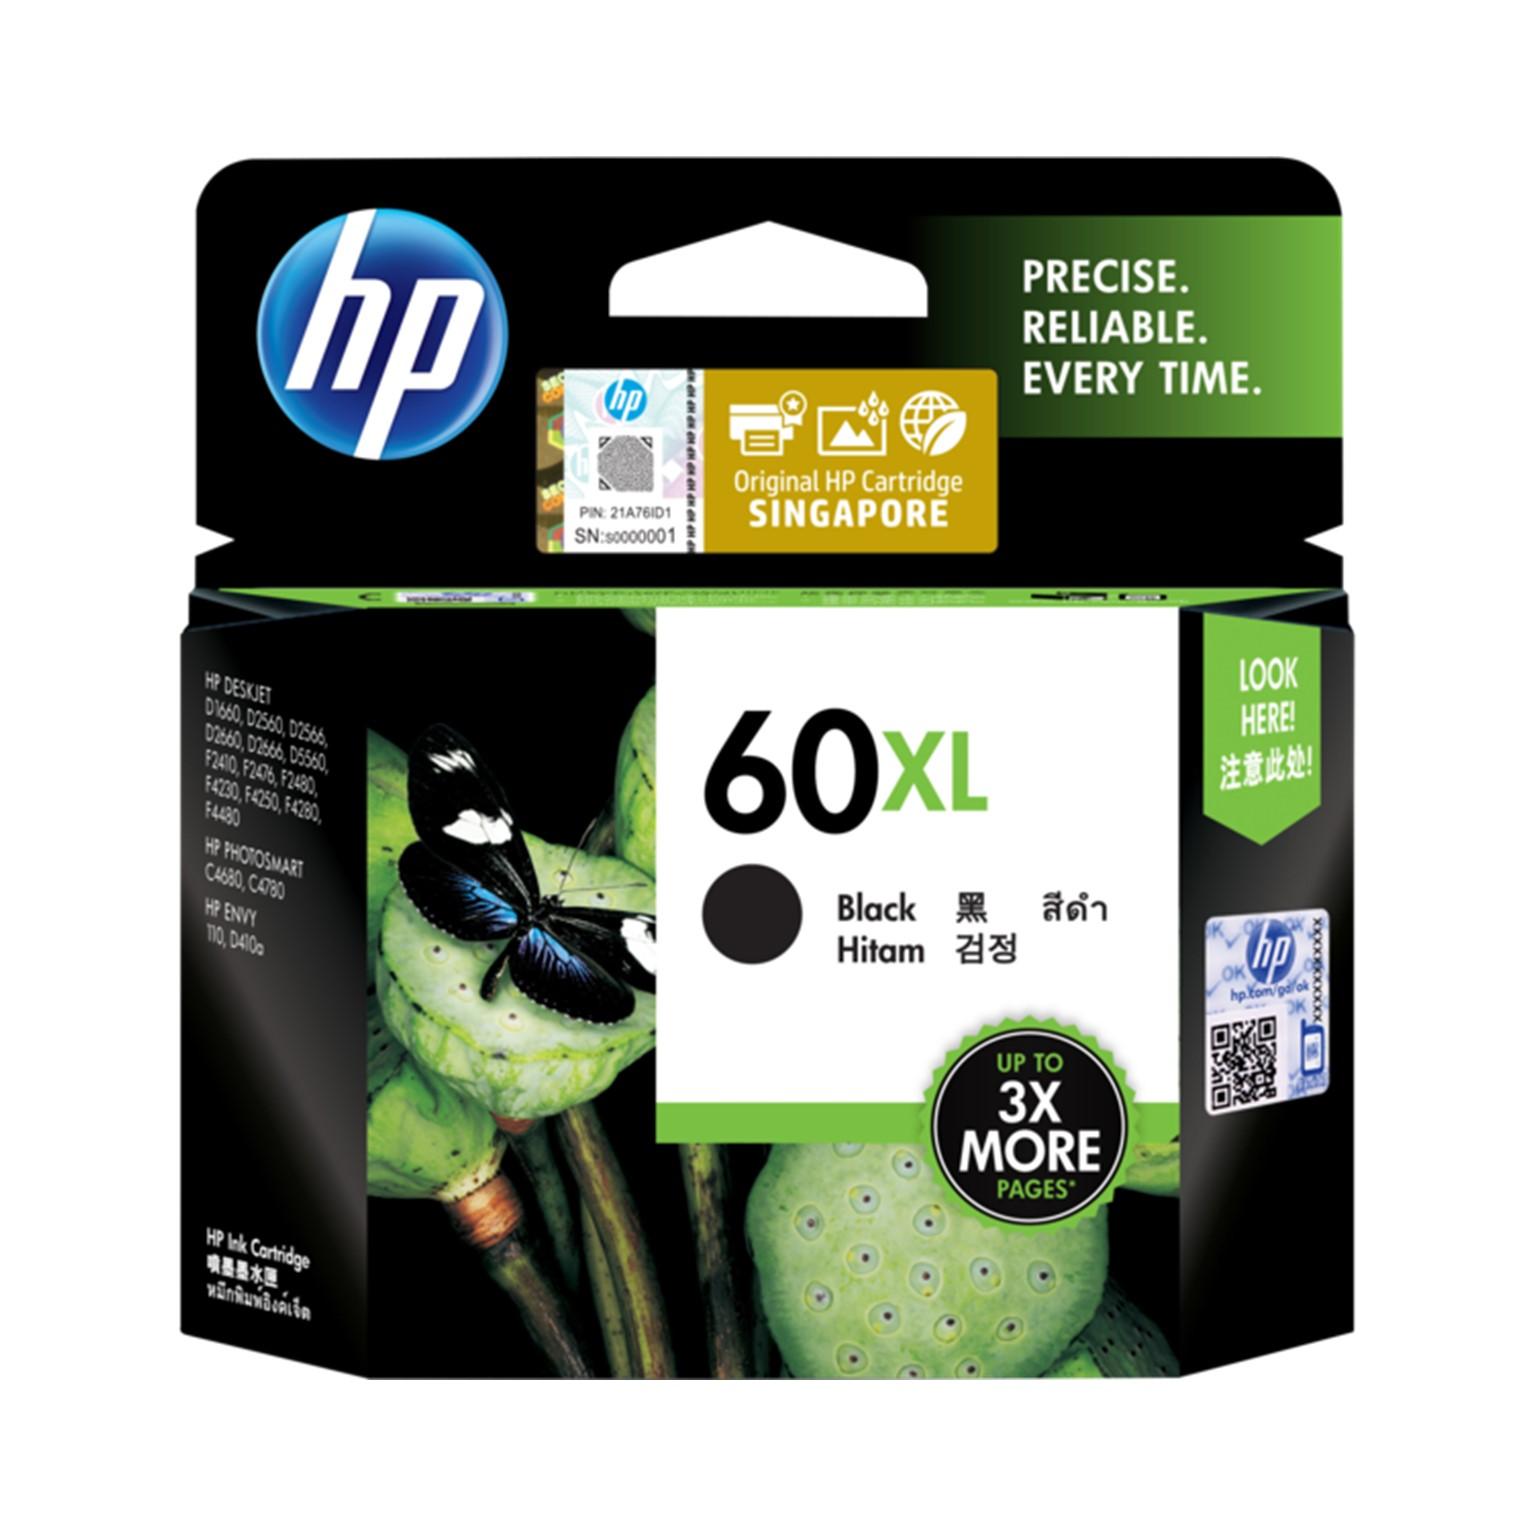 HP 60XL Black